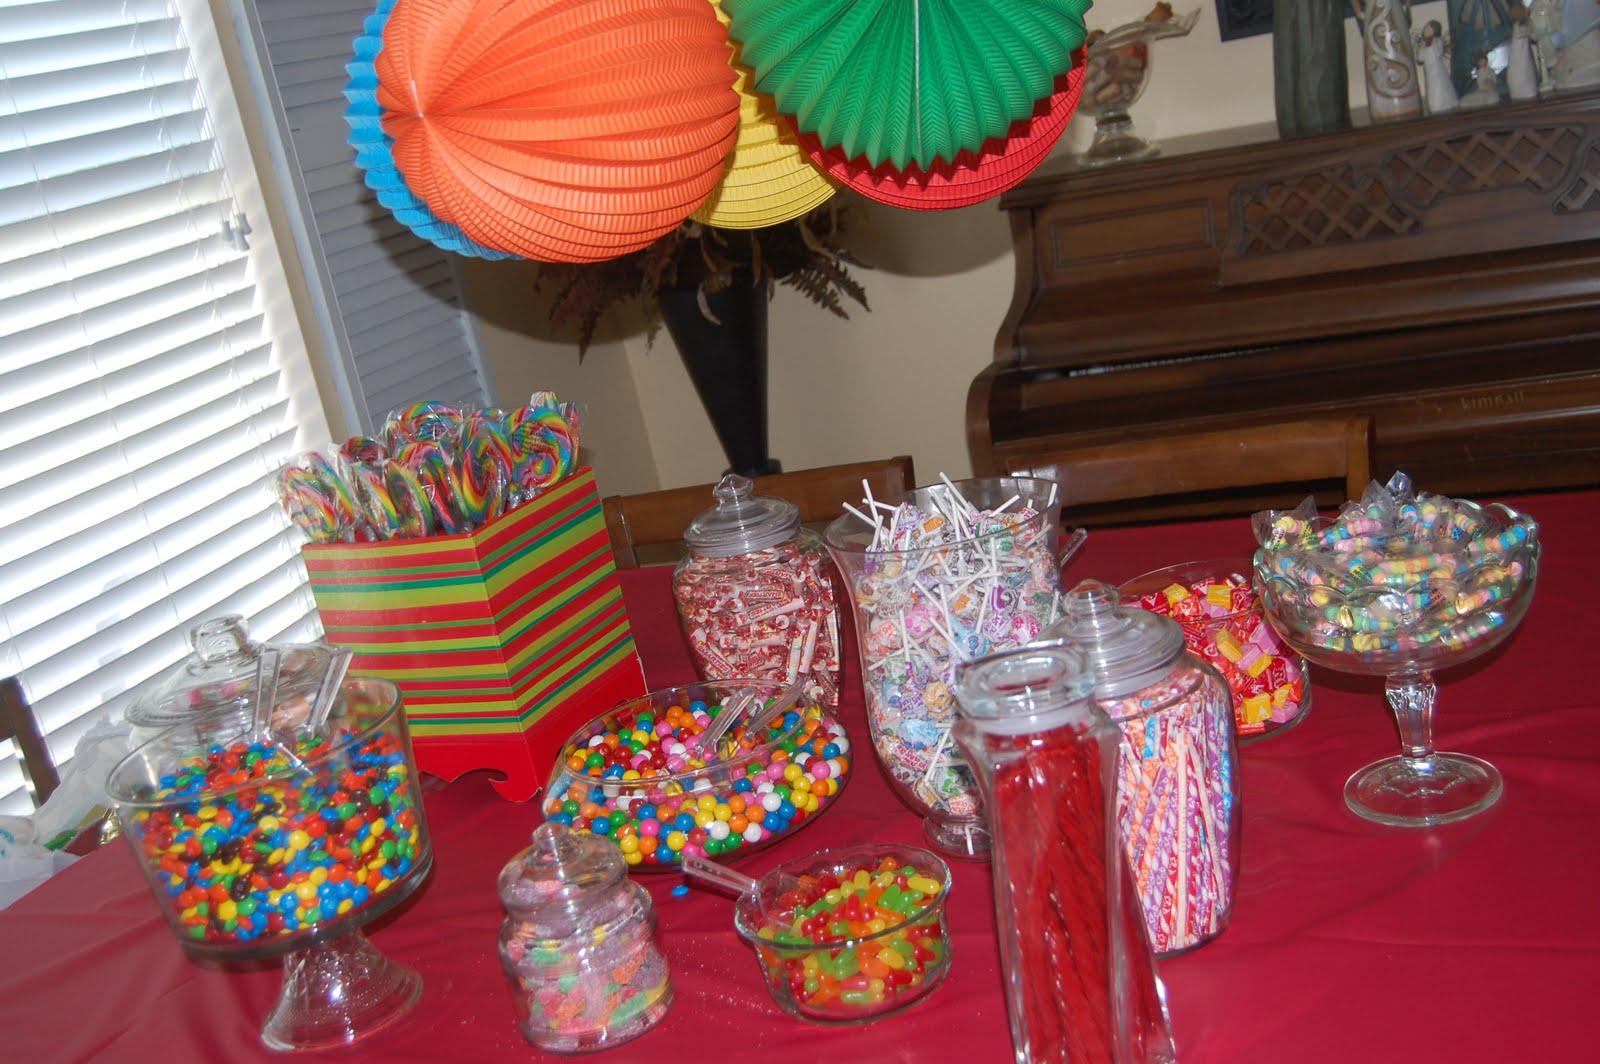 http://3.bp.blogspot.com/-MVcckMjVZTM/TfX7SpCIimI/AAAAAAAADC8/oMsq9x70Id8/s1600/candy%20bar%20birthday%20party.jpg